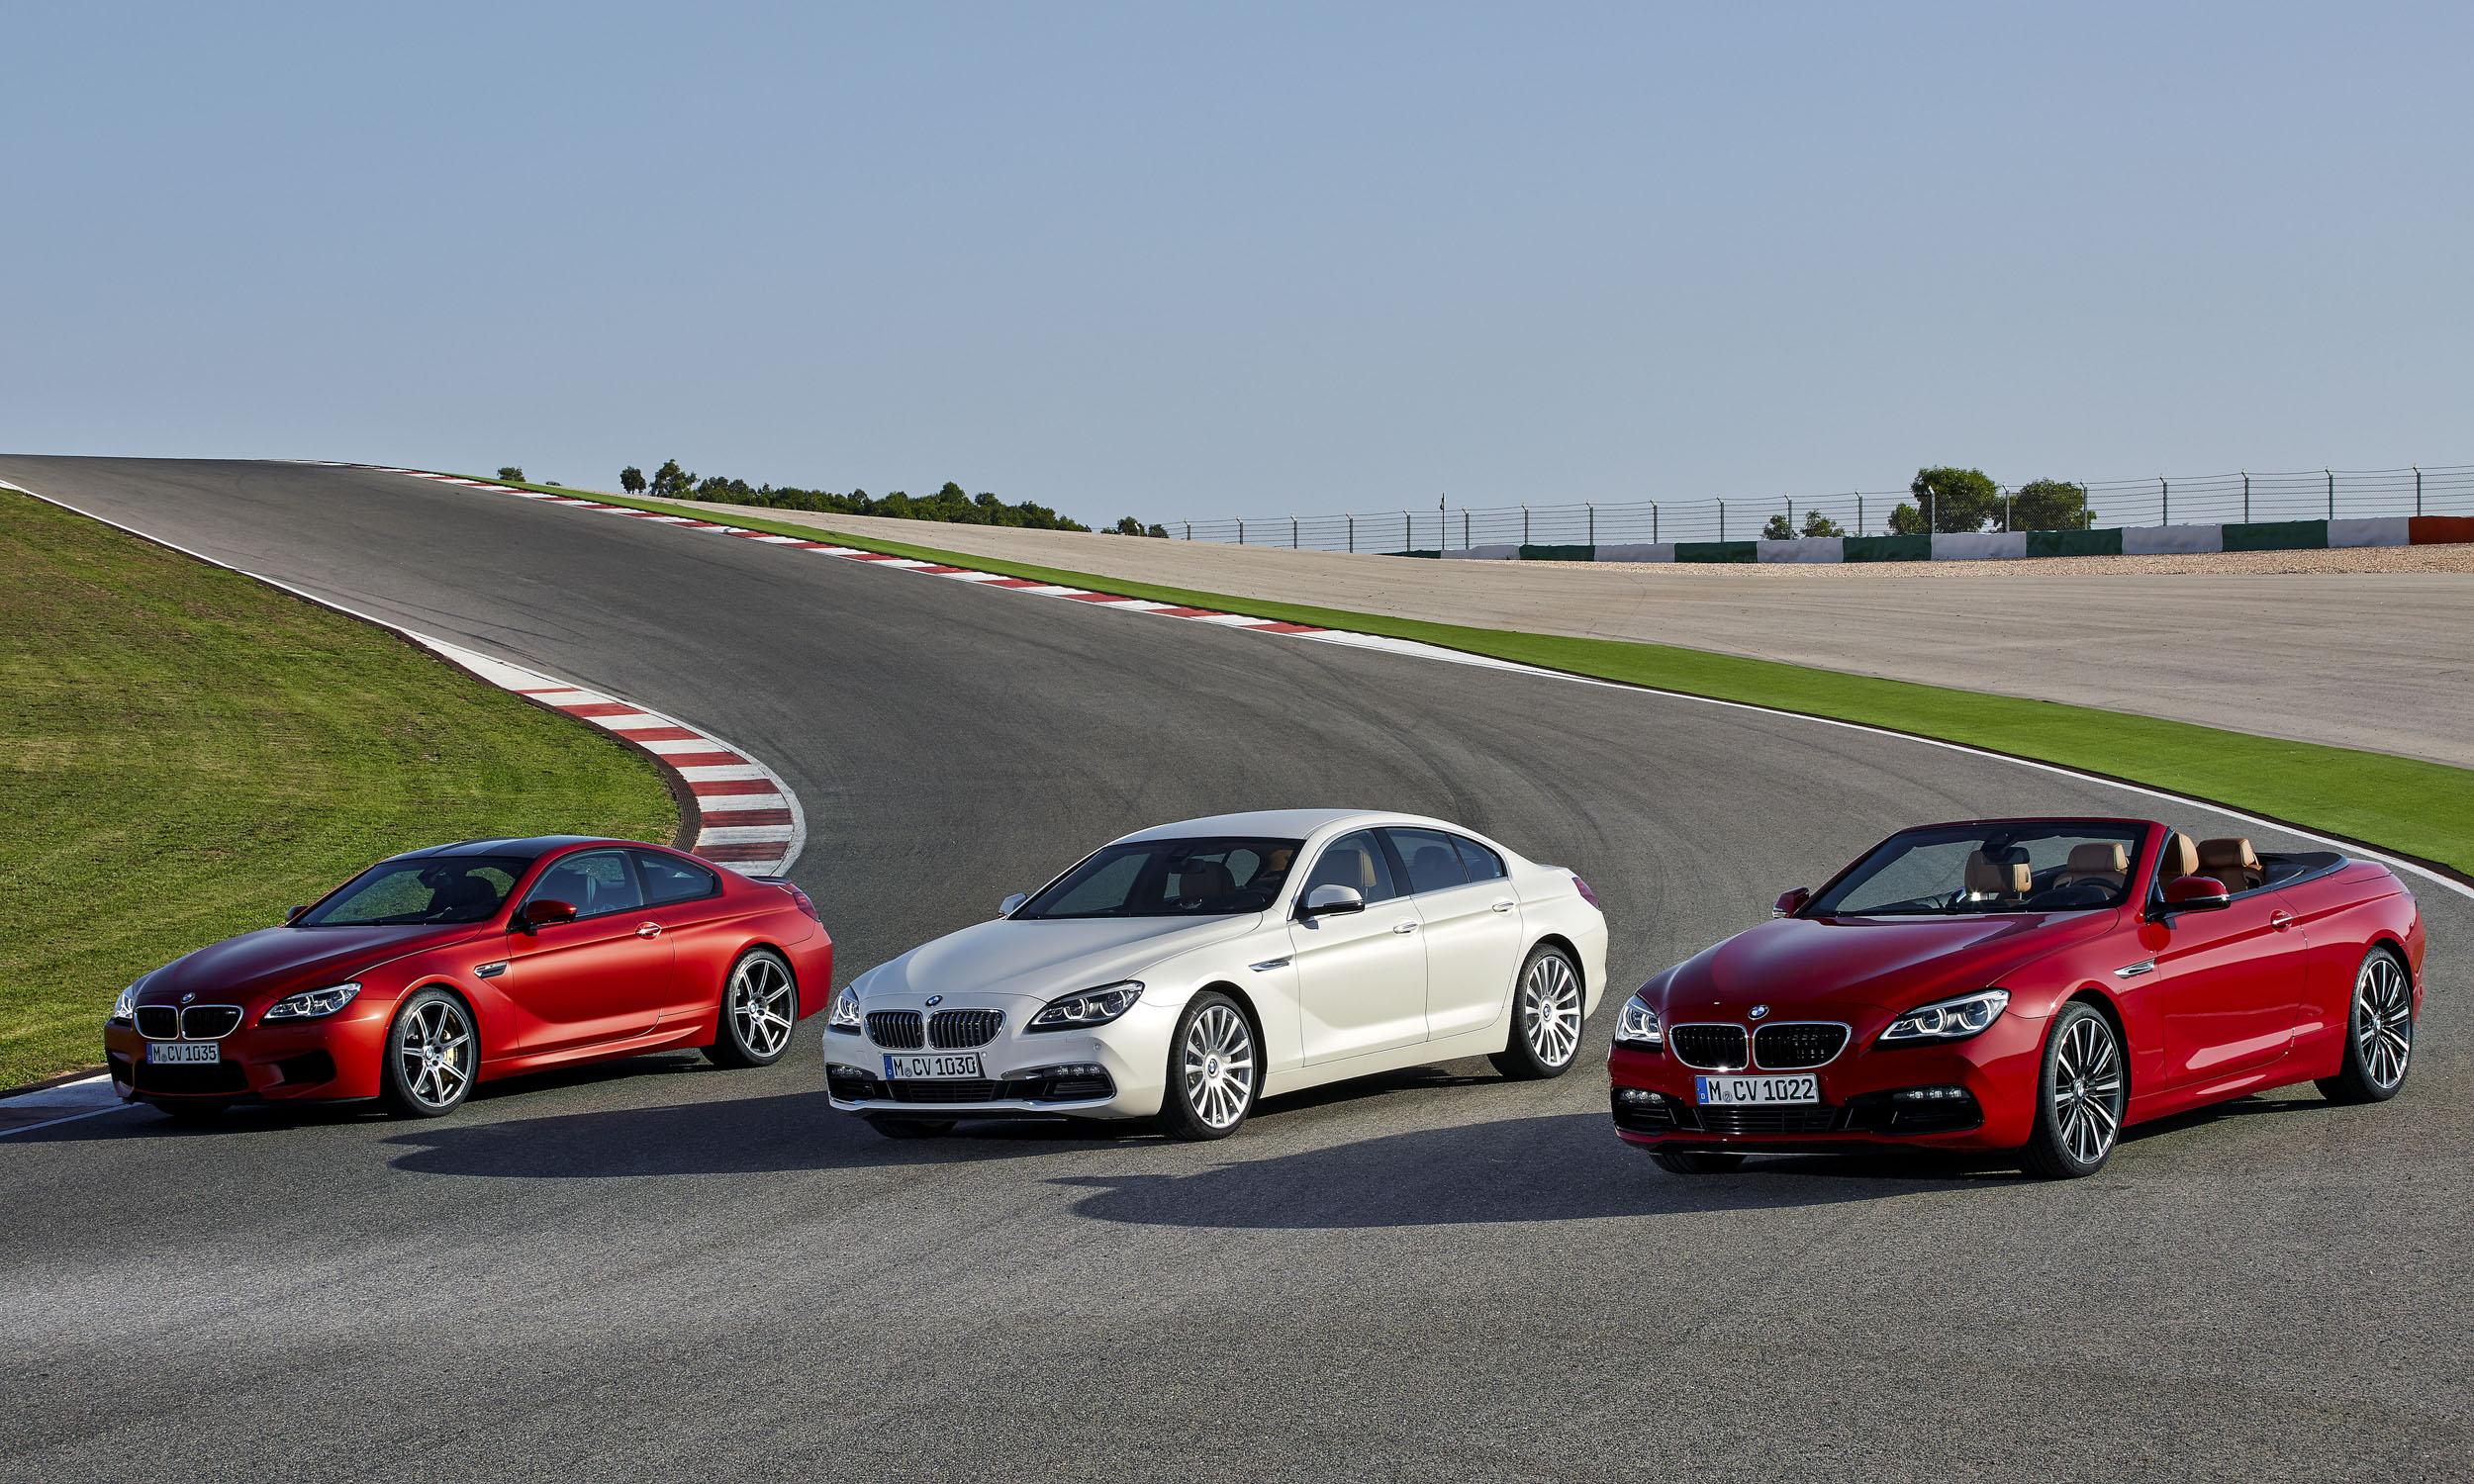 New Luxury For 2015 187 Autonxt